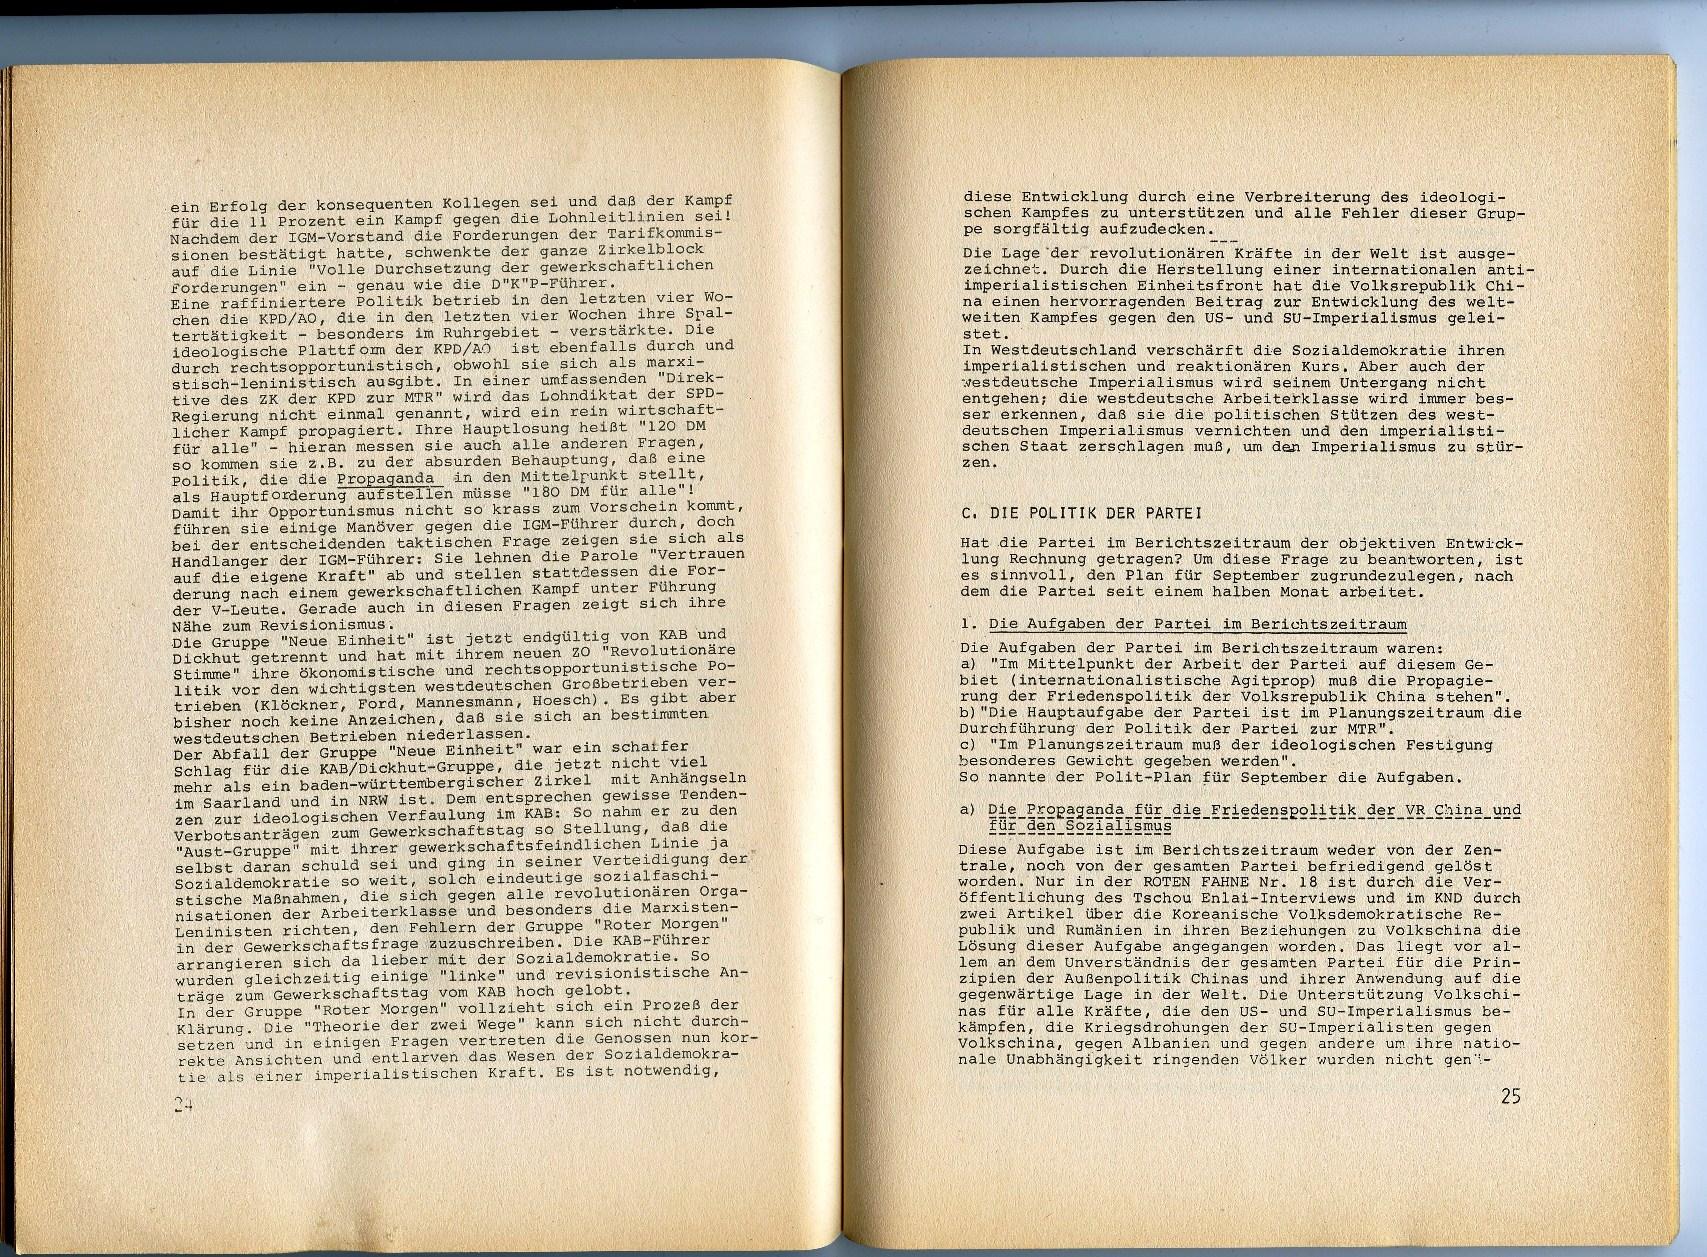 ZB_Parteiarbeiter_1971_08_14